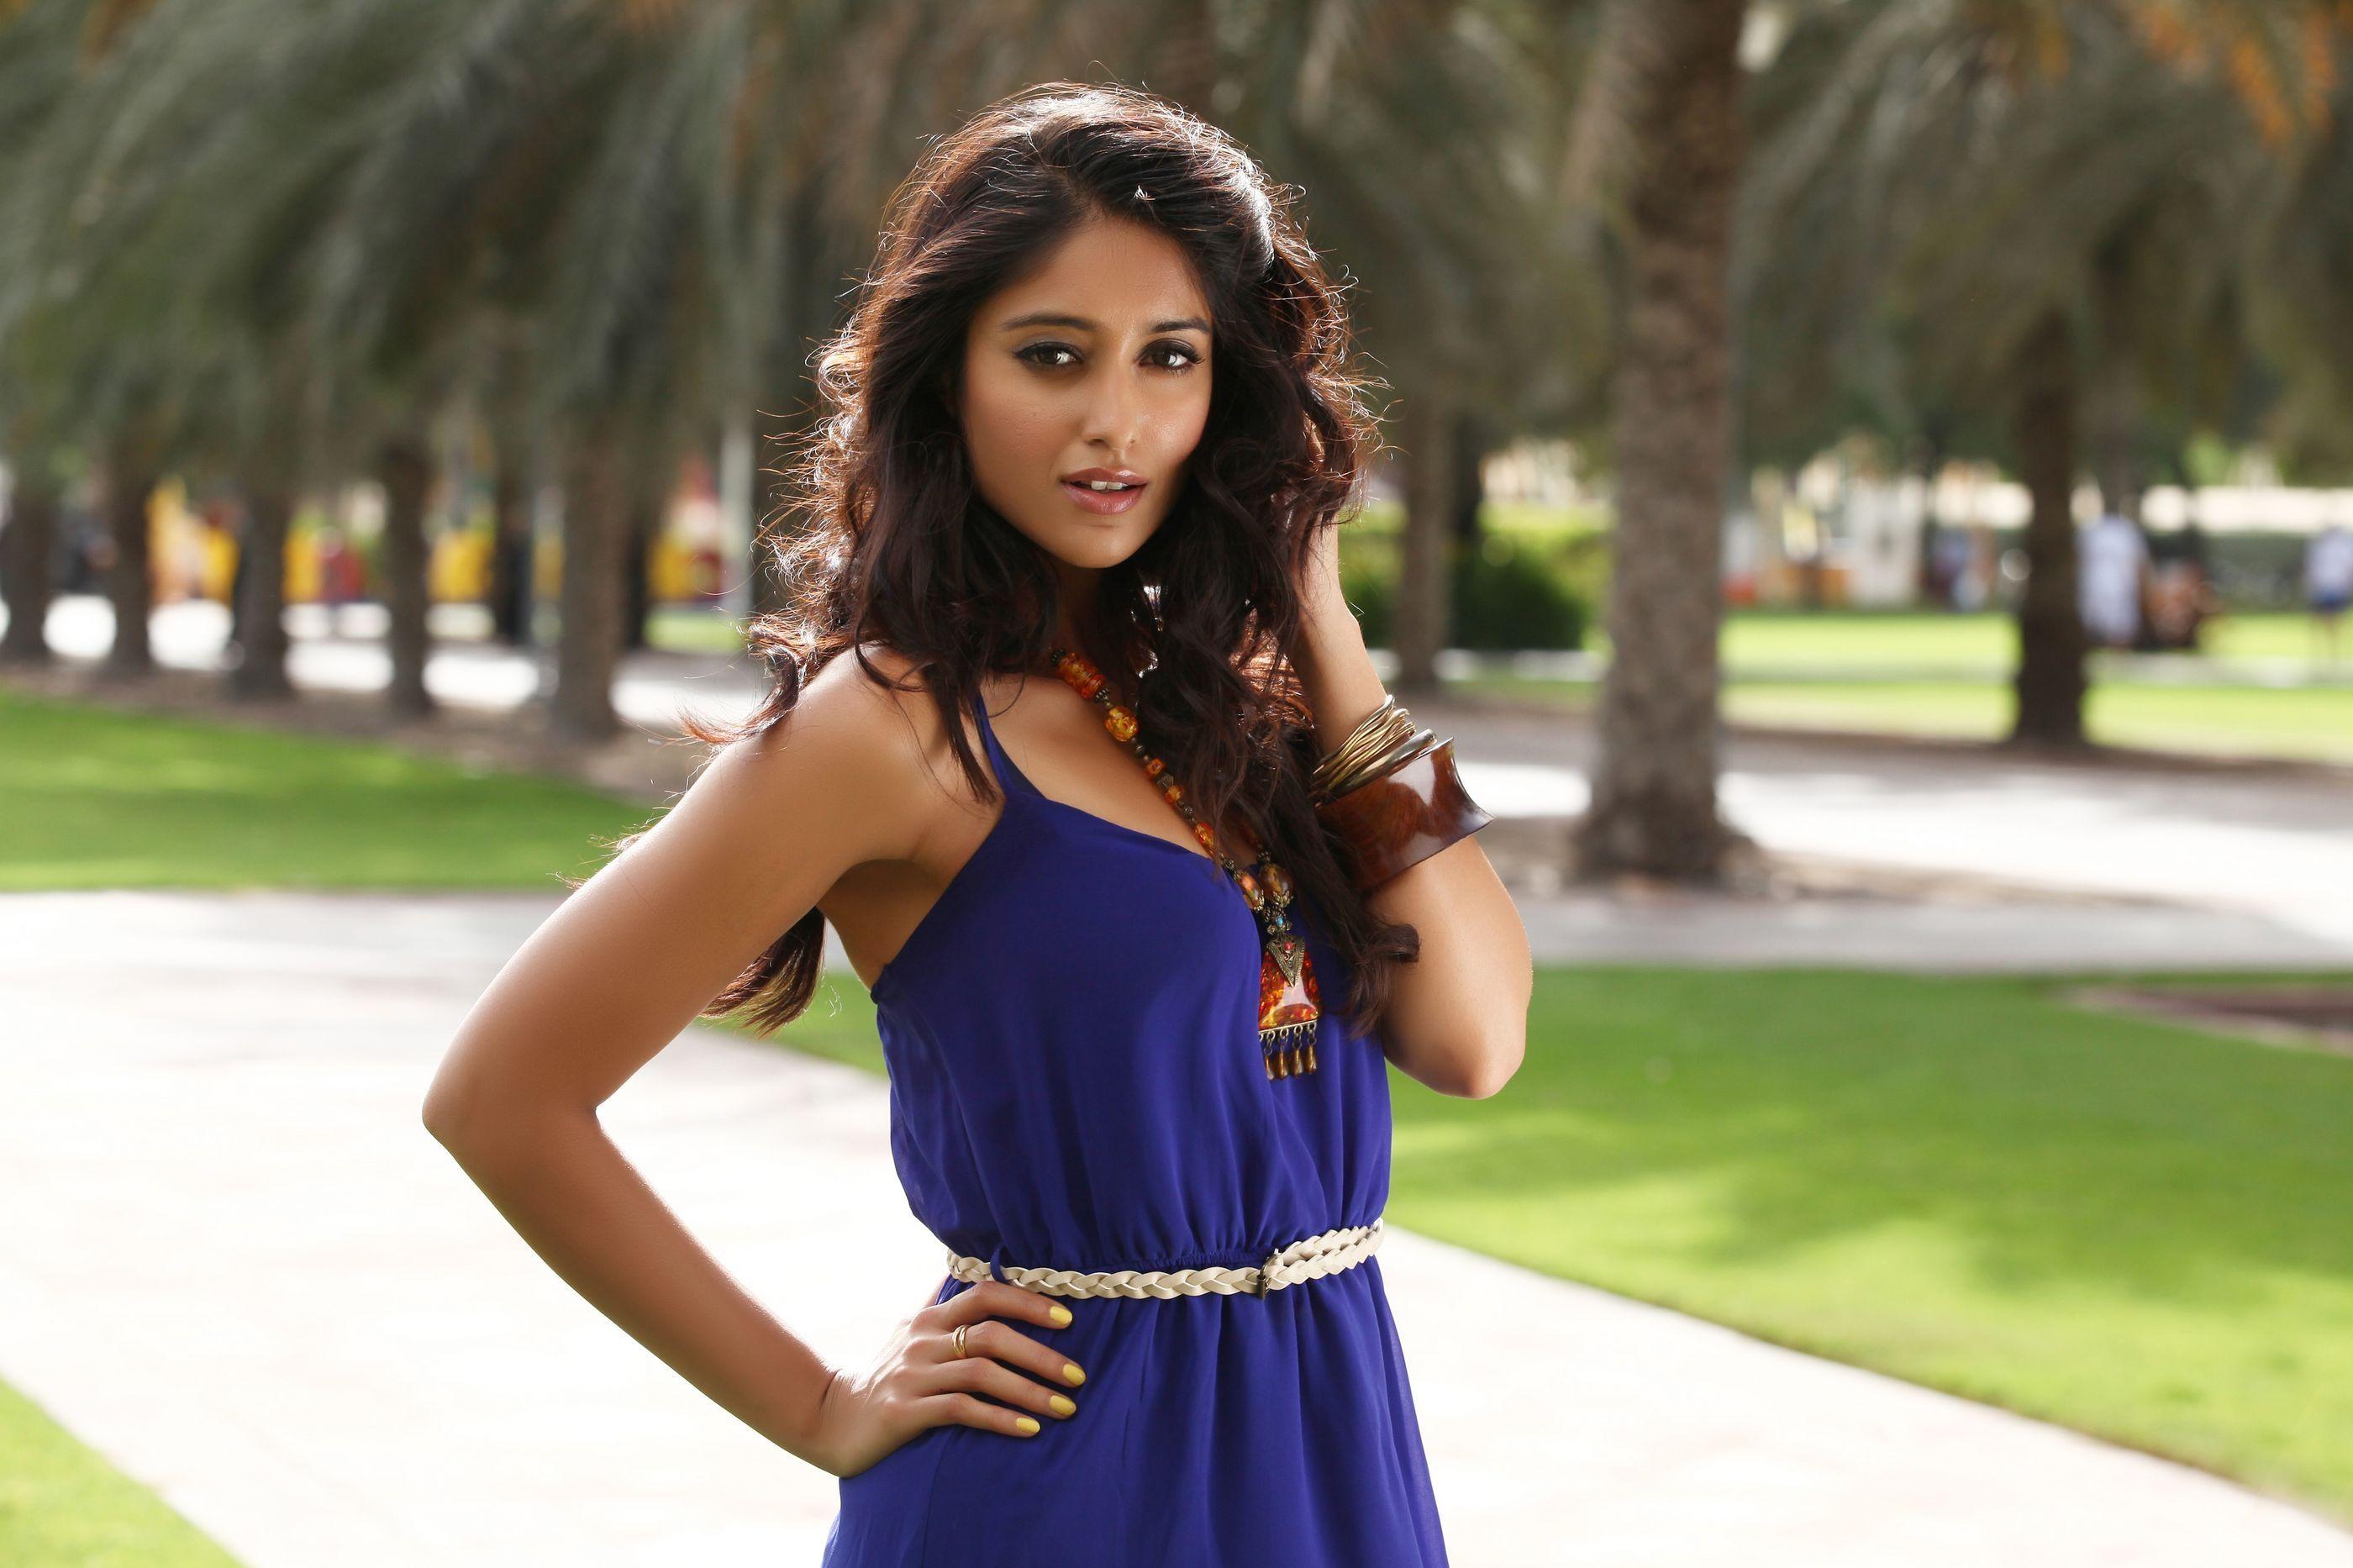 ileana dcruz in blue dress wallpaper photo and images - http://bit